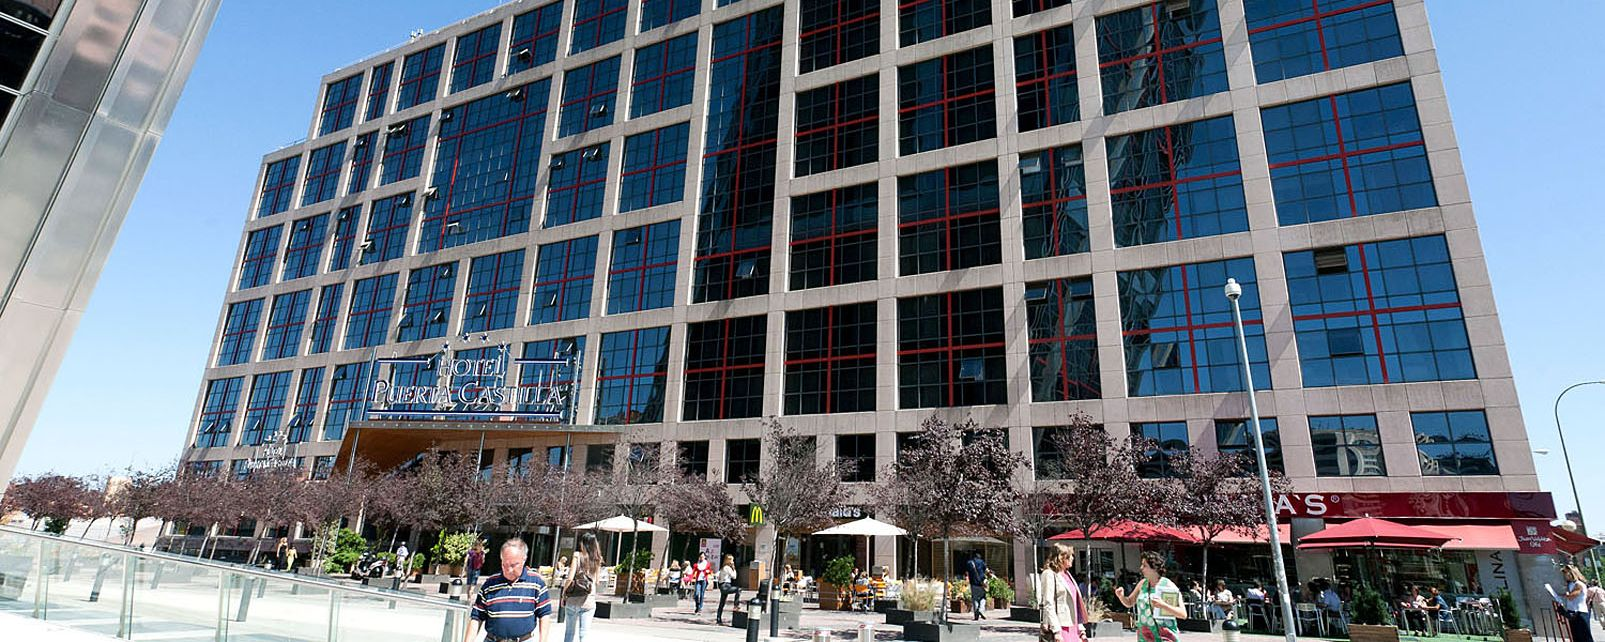 Hotel Hotusa EXE Puerta de Castilla